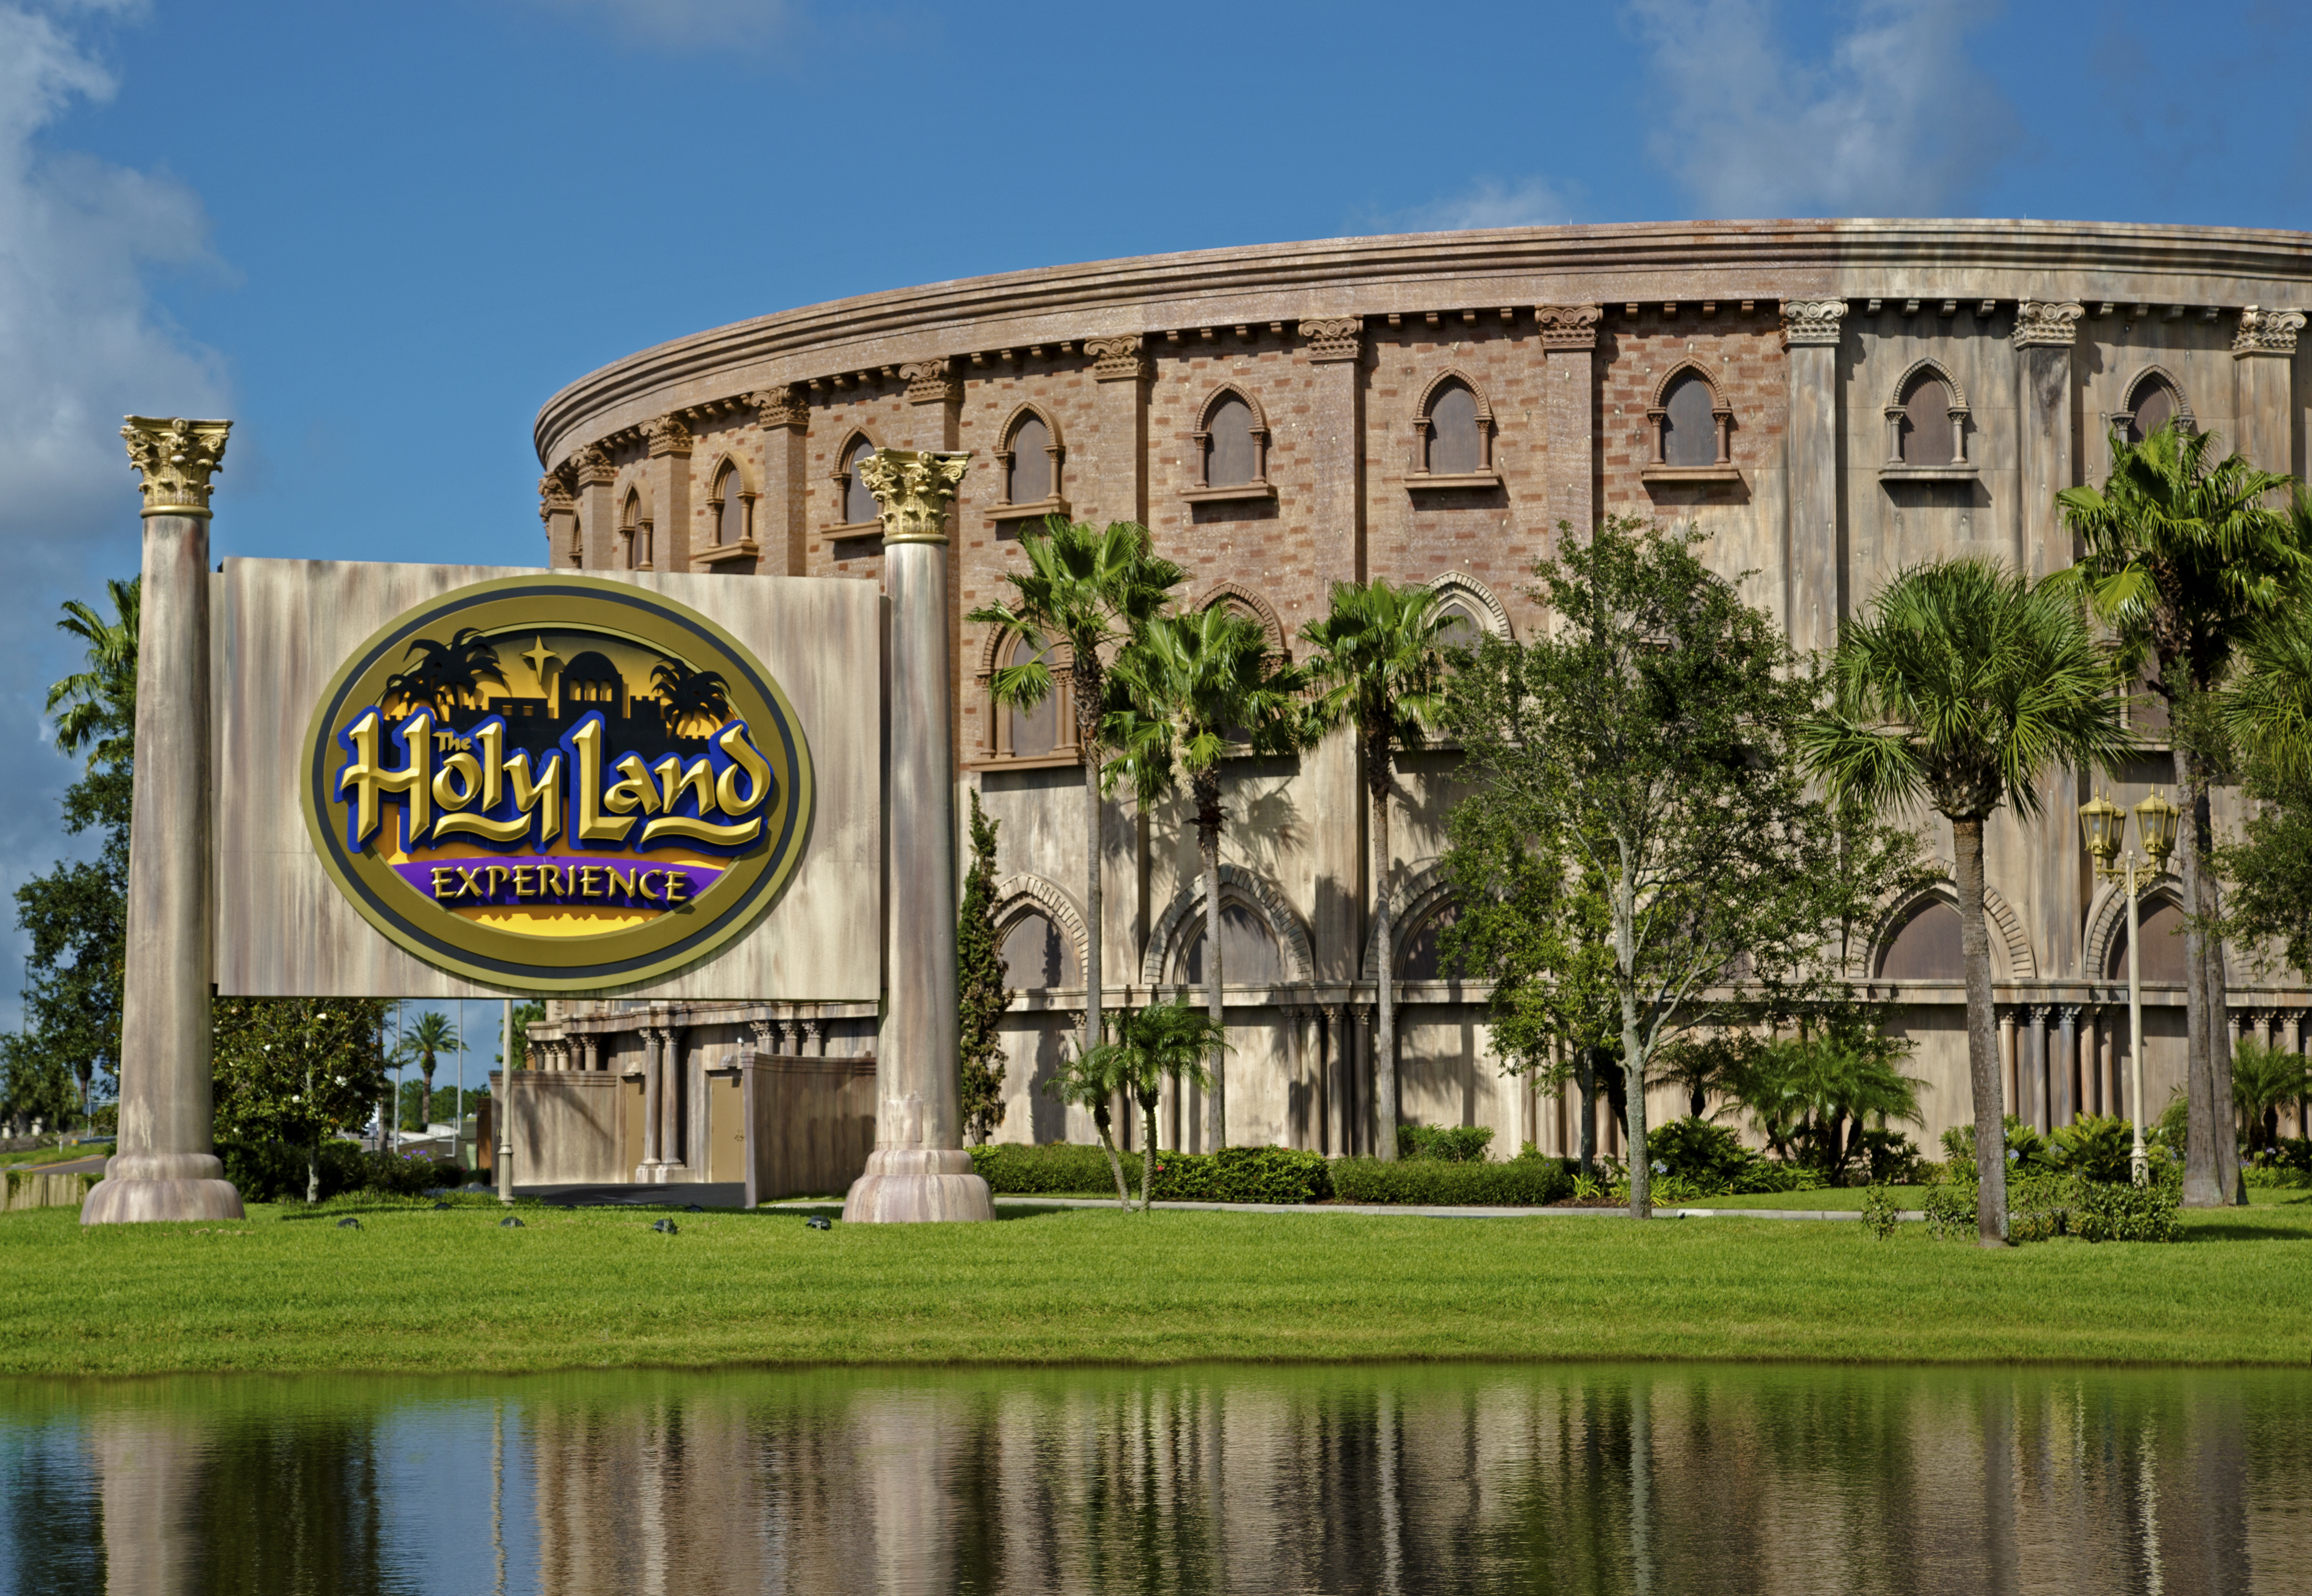 Holy Land Experience - Wikipedia Lord Palms Orlando Map on california orlando, windsor hills orlando, baldwin park orlando, sunland orlando, hollywood orlando,